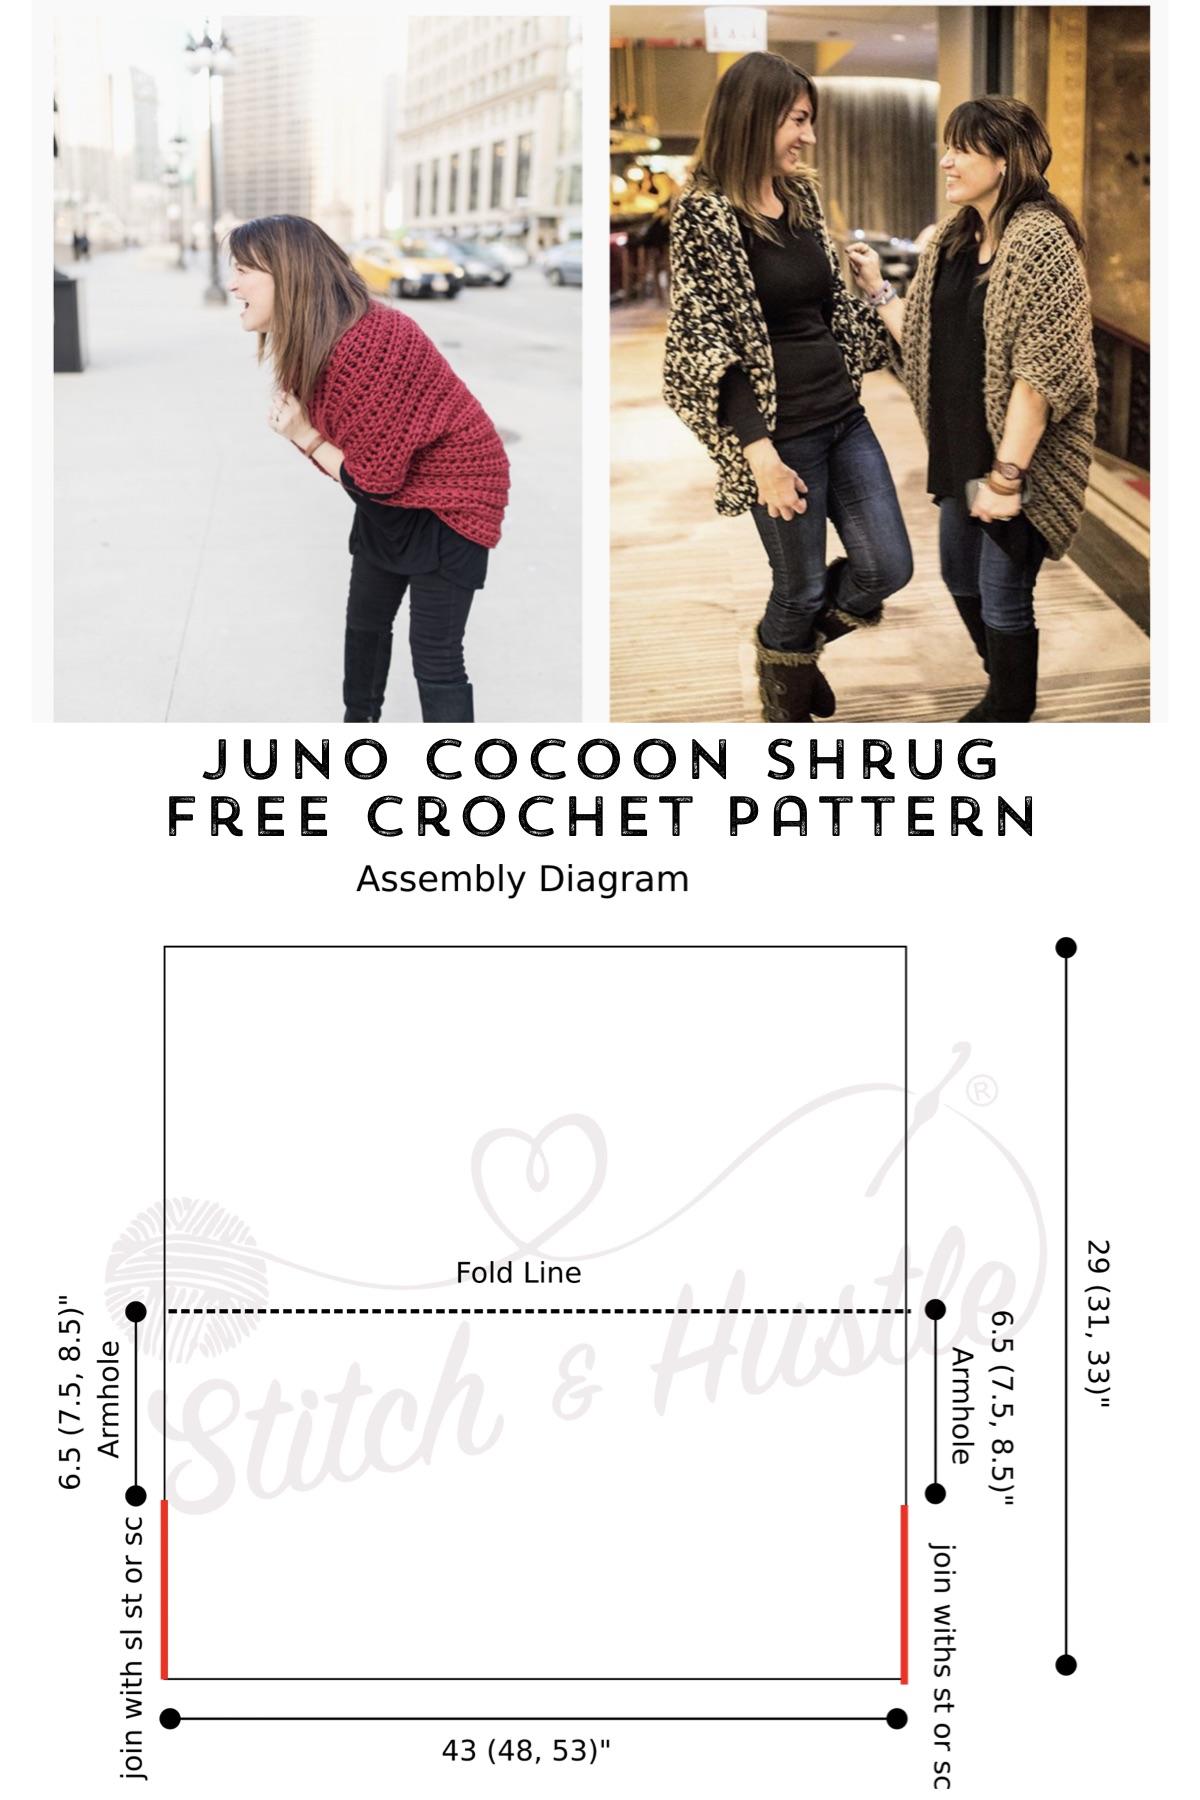 chunky_cocoon_chrug_free_crochet_pattern_1.jpg